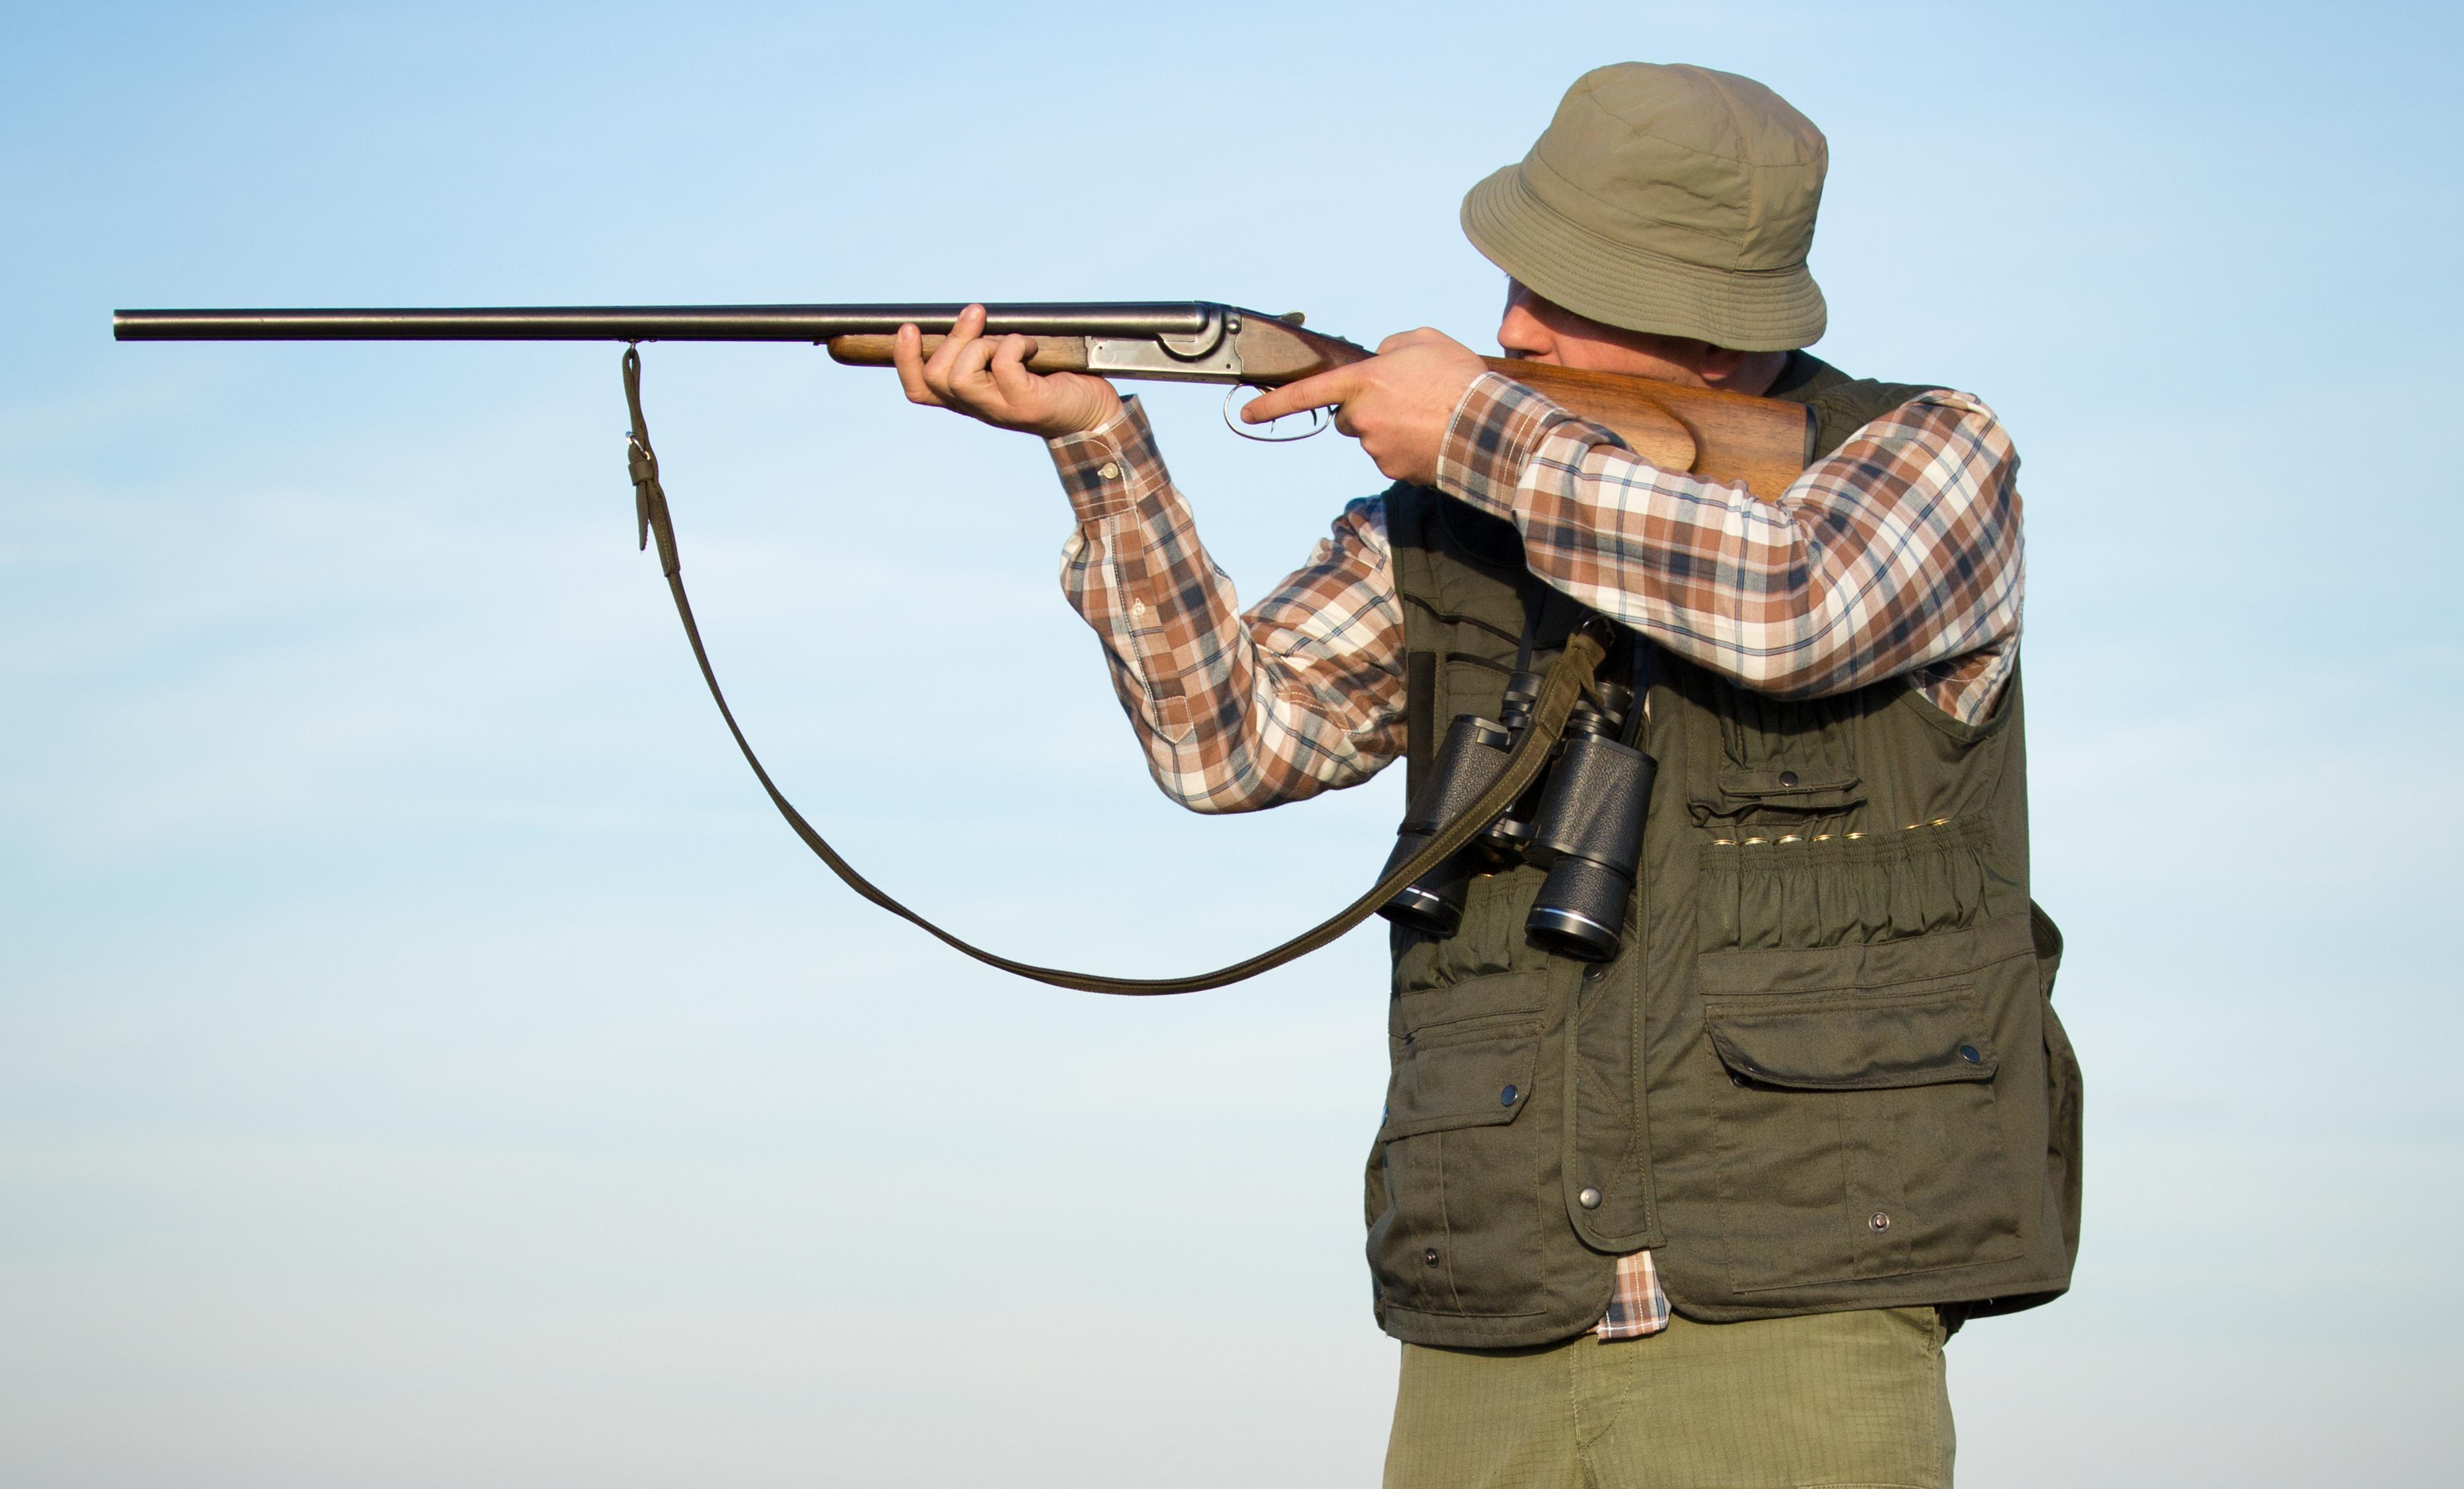 Game hunters tip 50,000